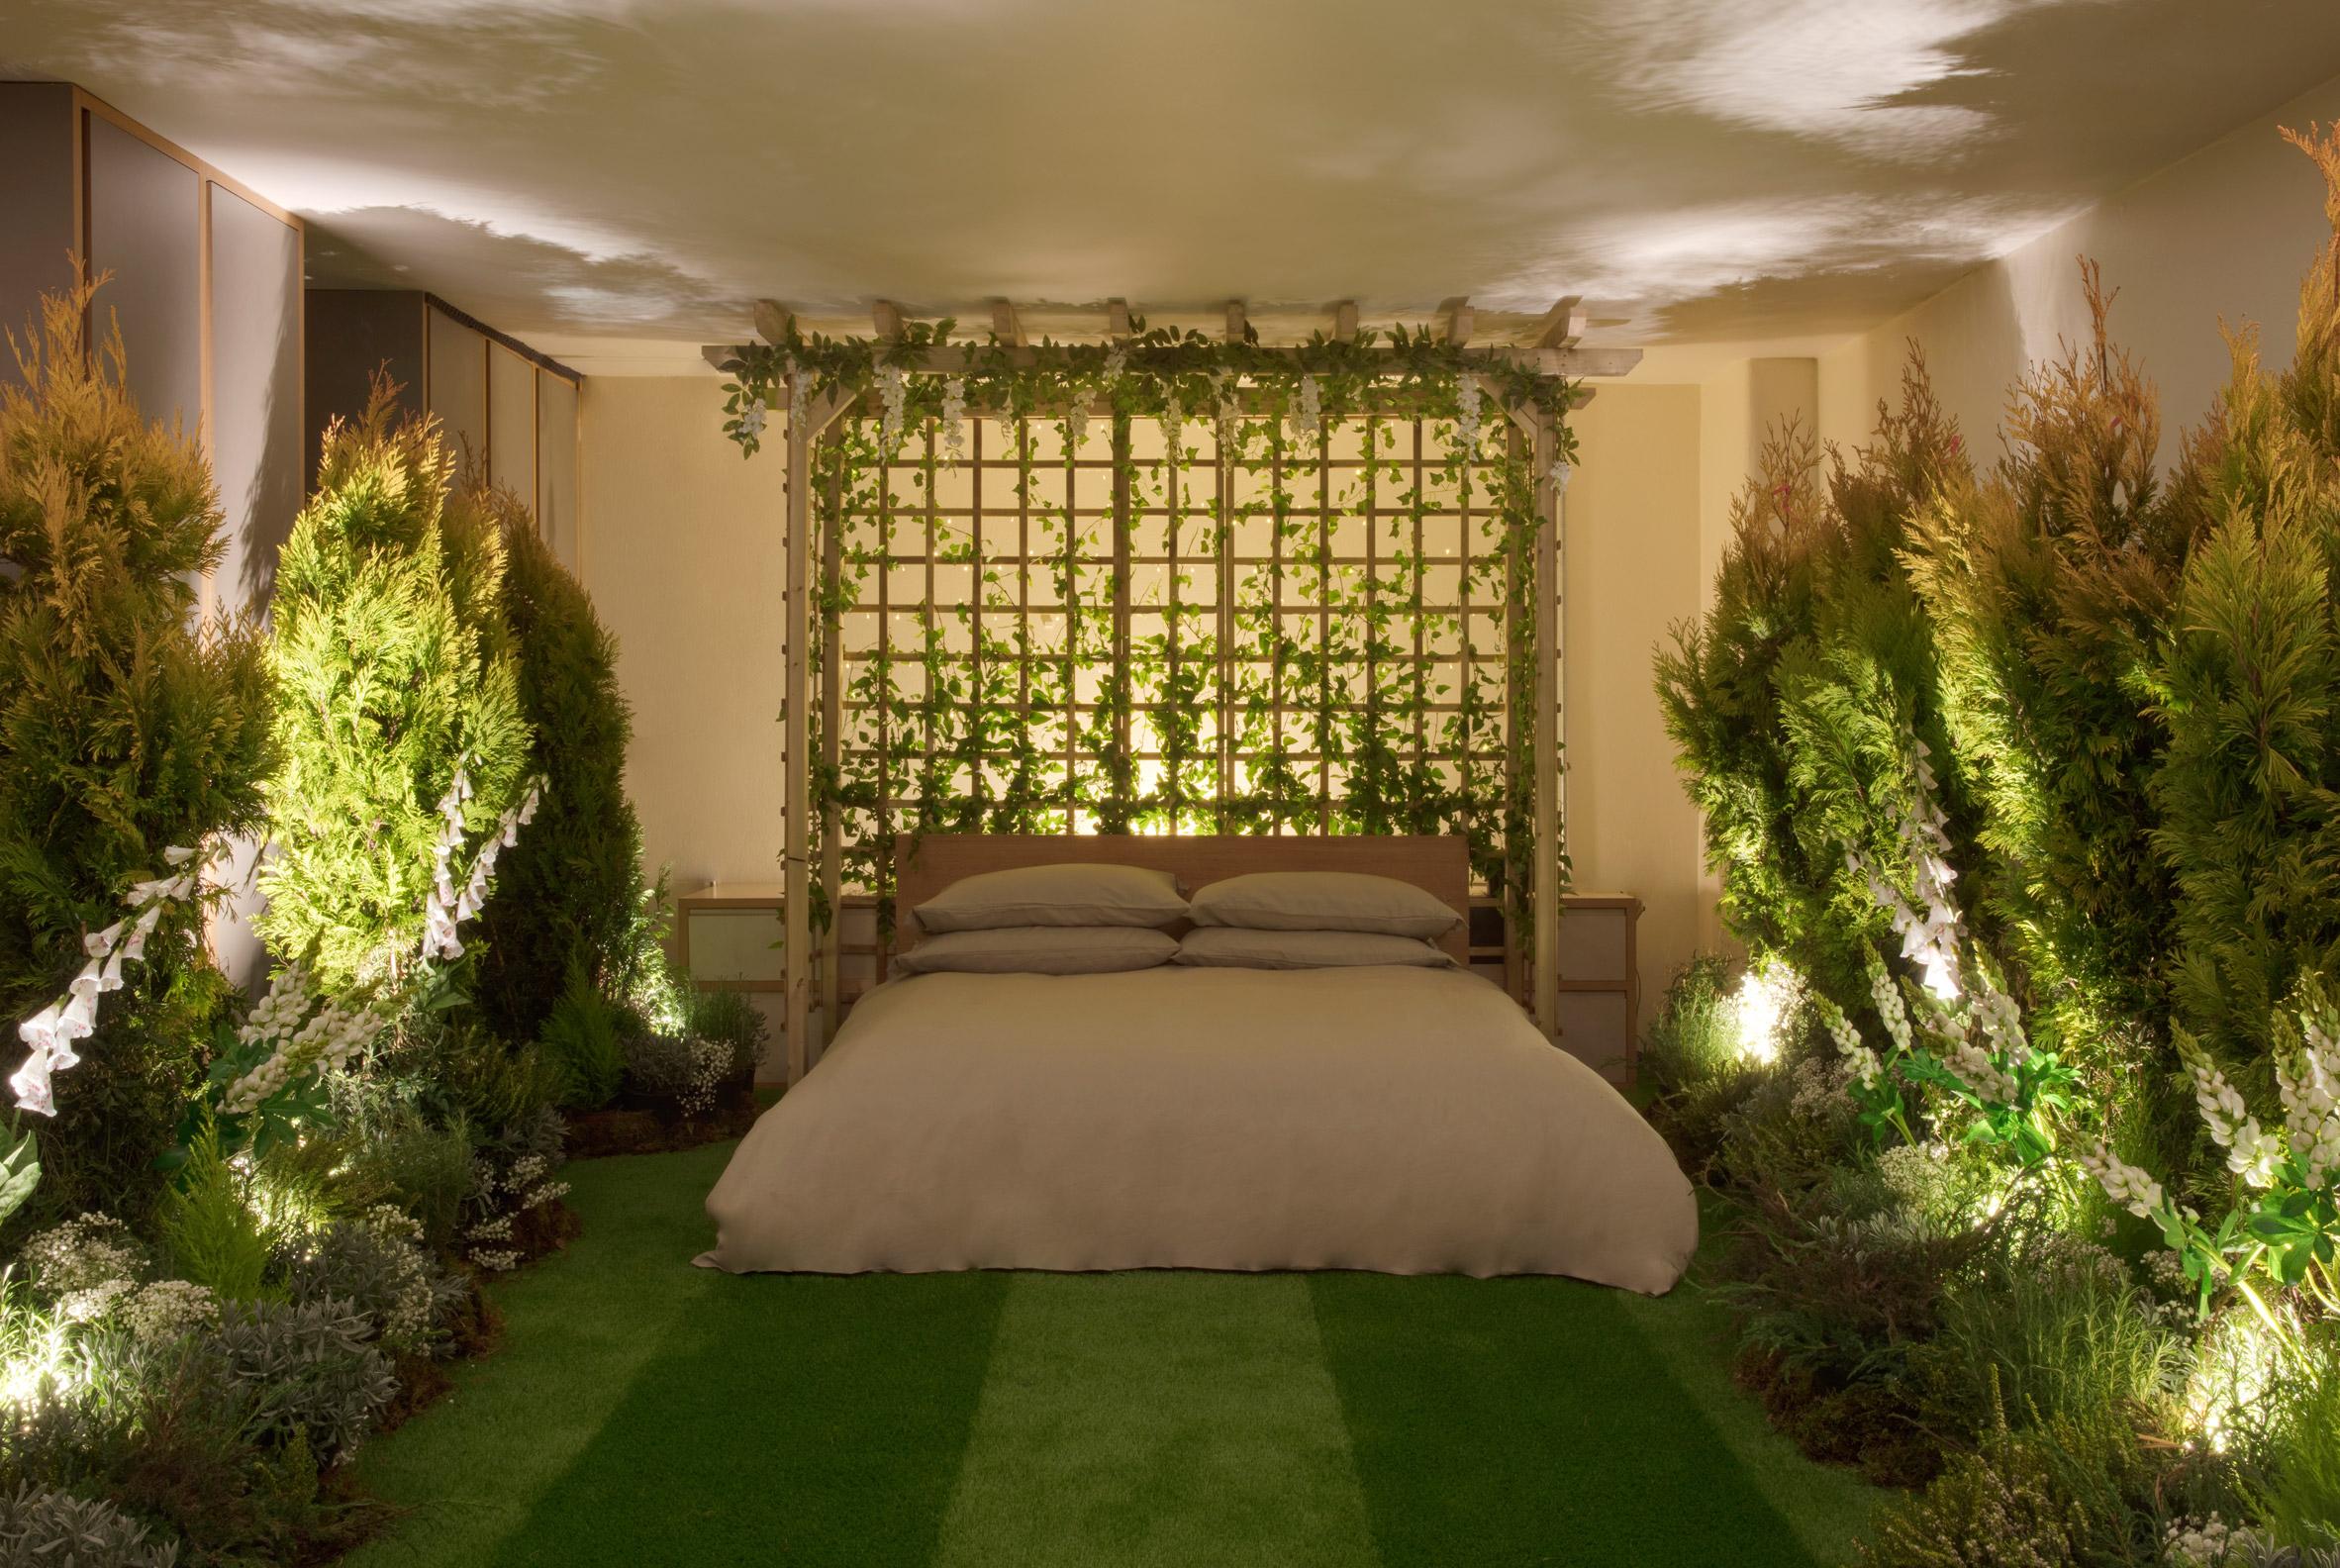 greenery-apartment-installation-airbnb-pantone-design_dezeen_2364_col_10.jpg